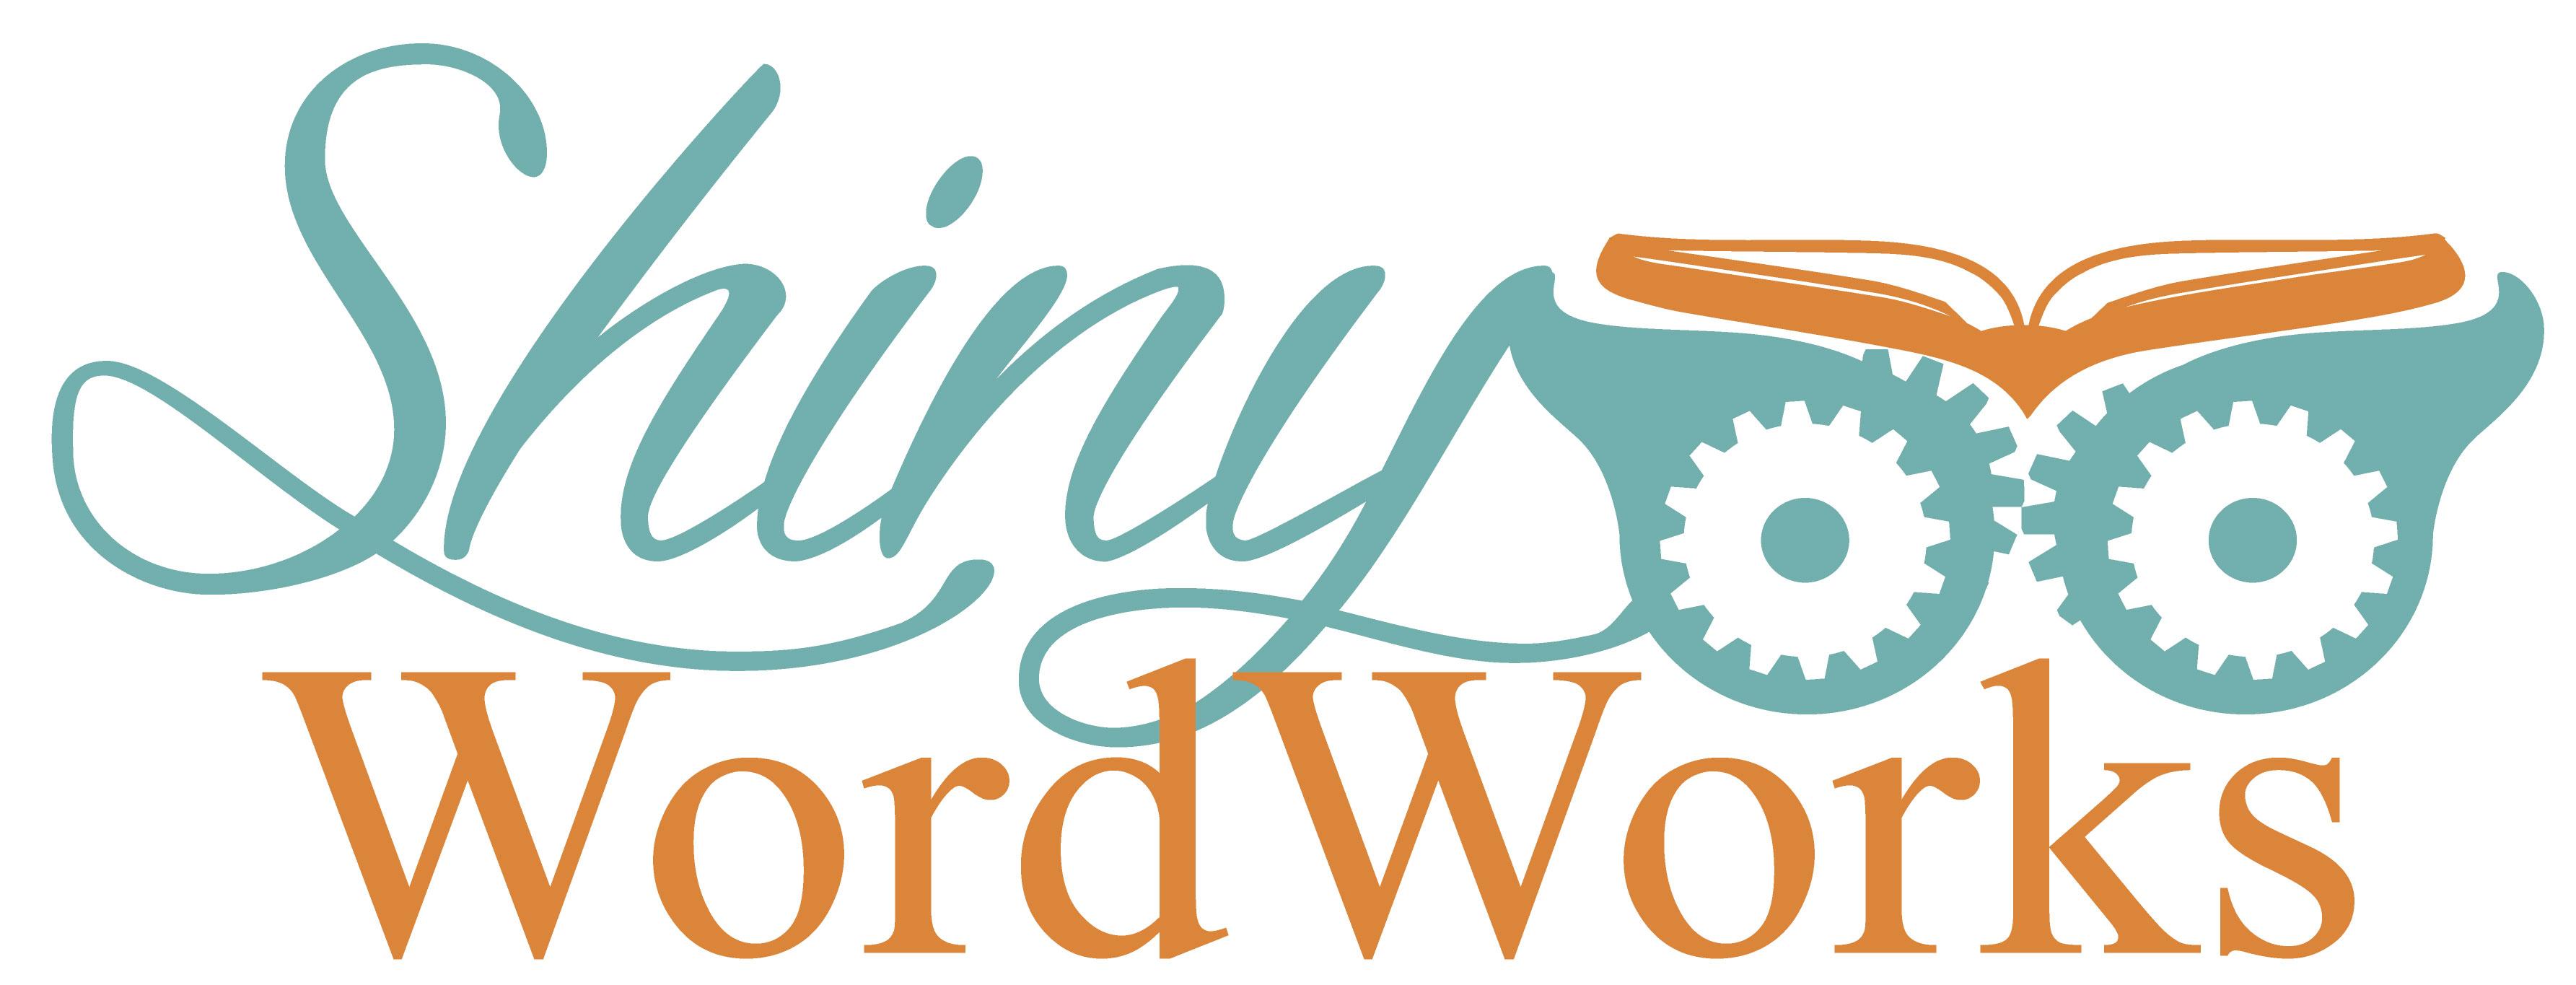 ShinyWordworks-logo